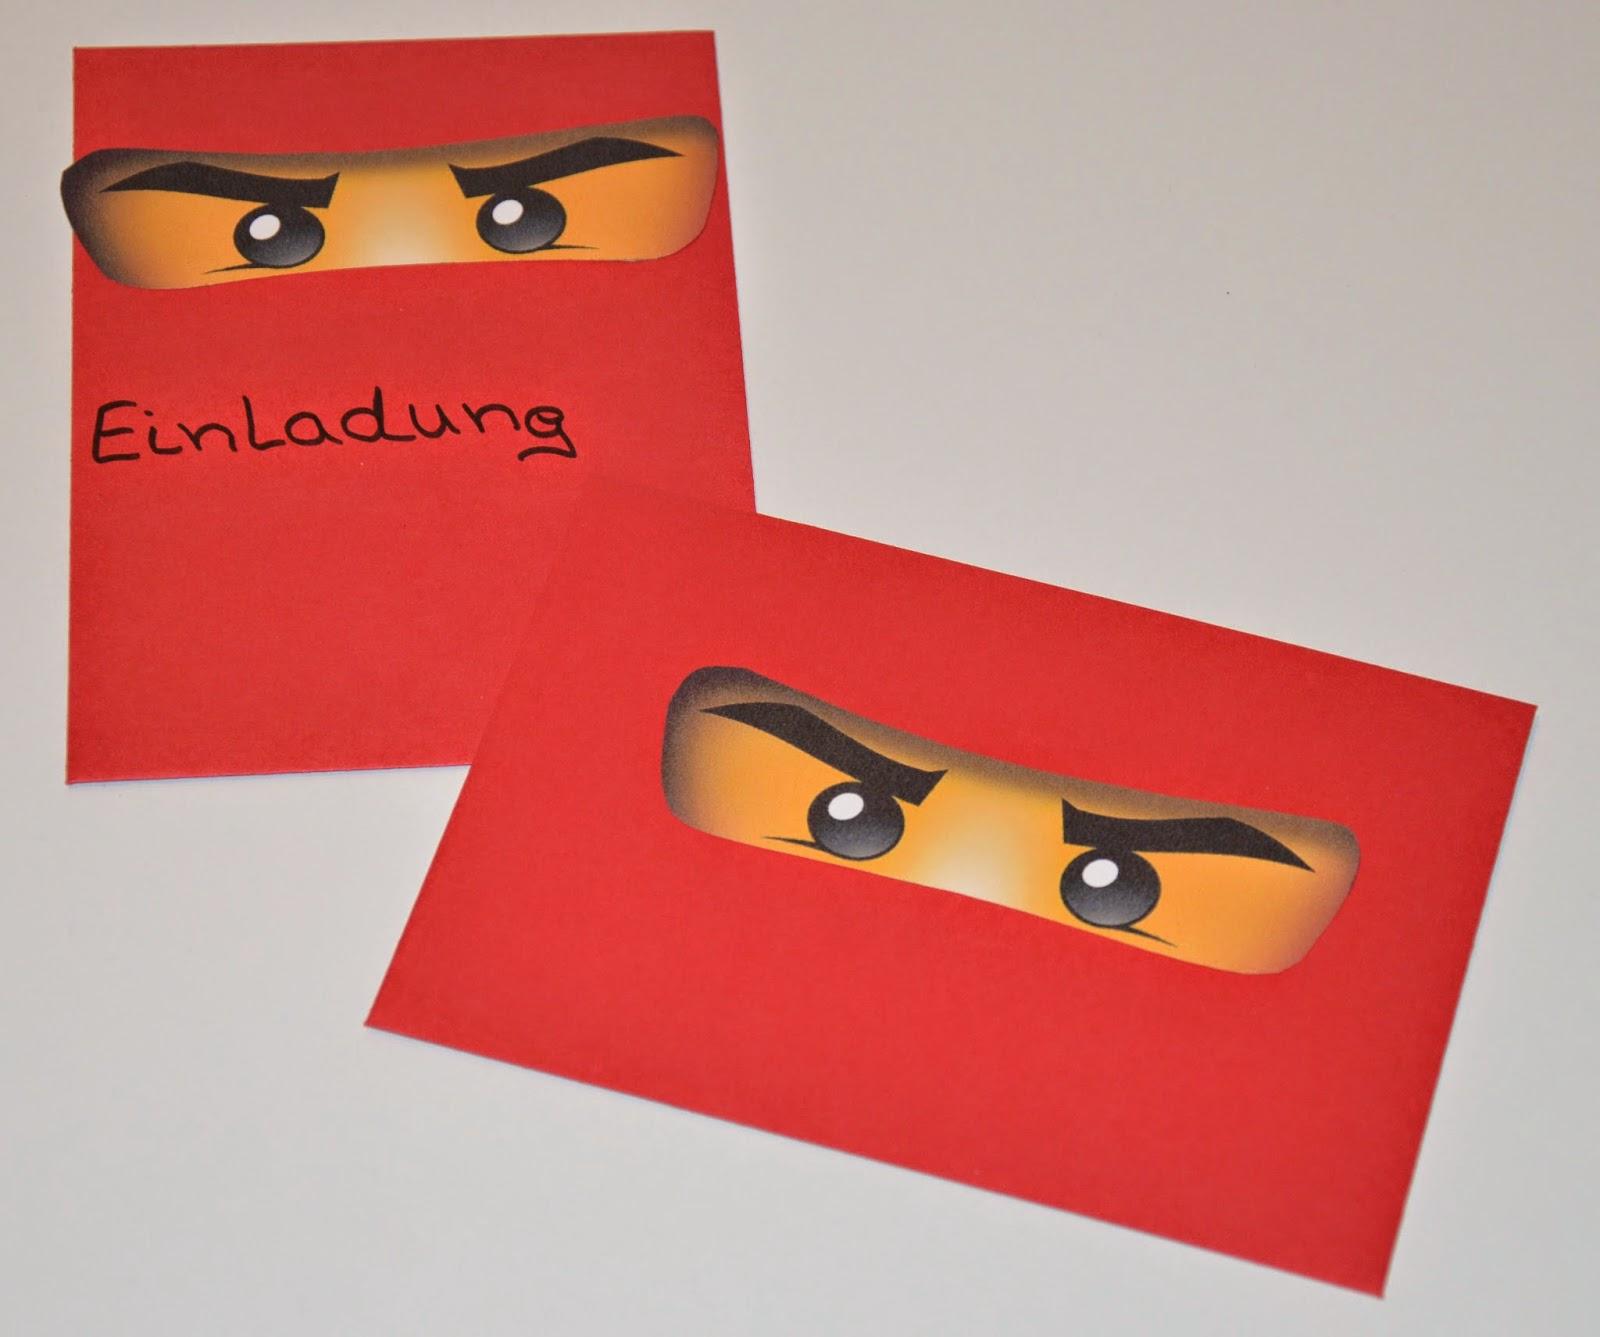 lego ninjago einladungskarten – kathyprice, Einladungsentwurf